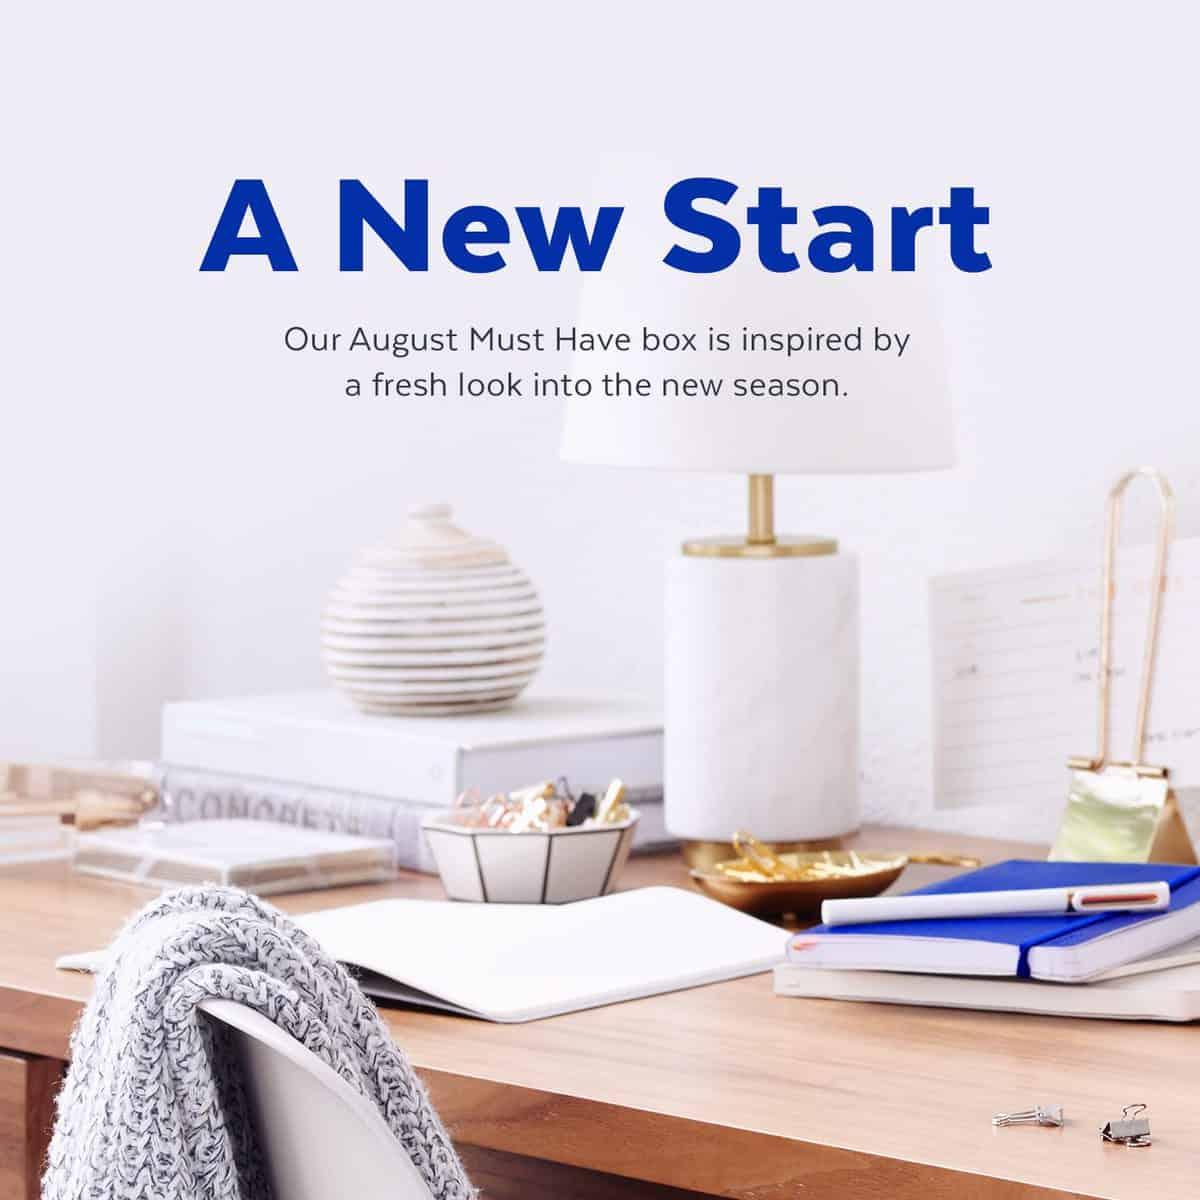 POPSUGAR August 2016 Must Have Box Theme - New Start